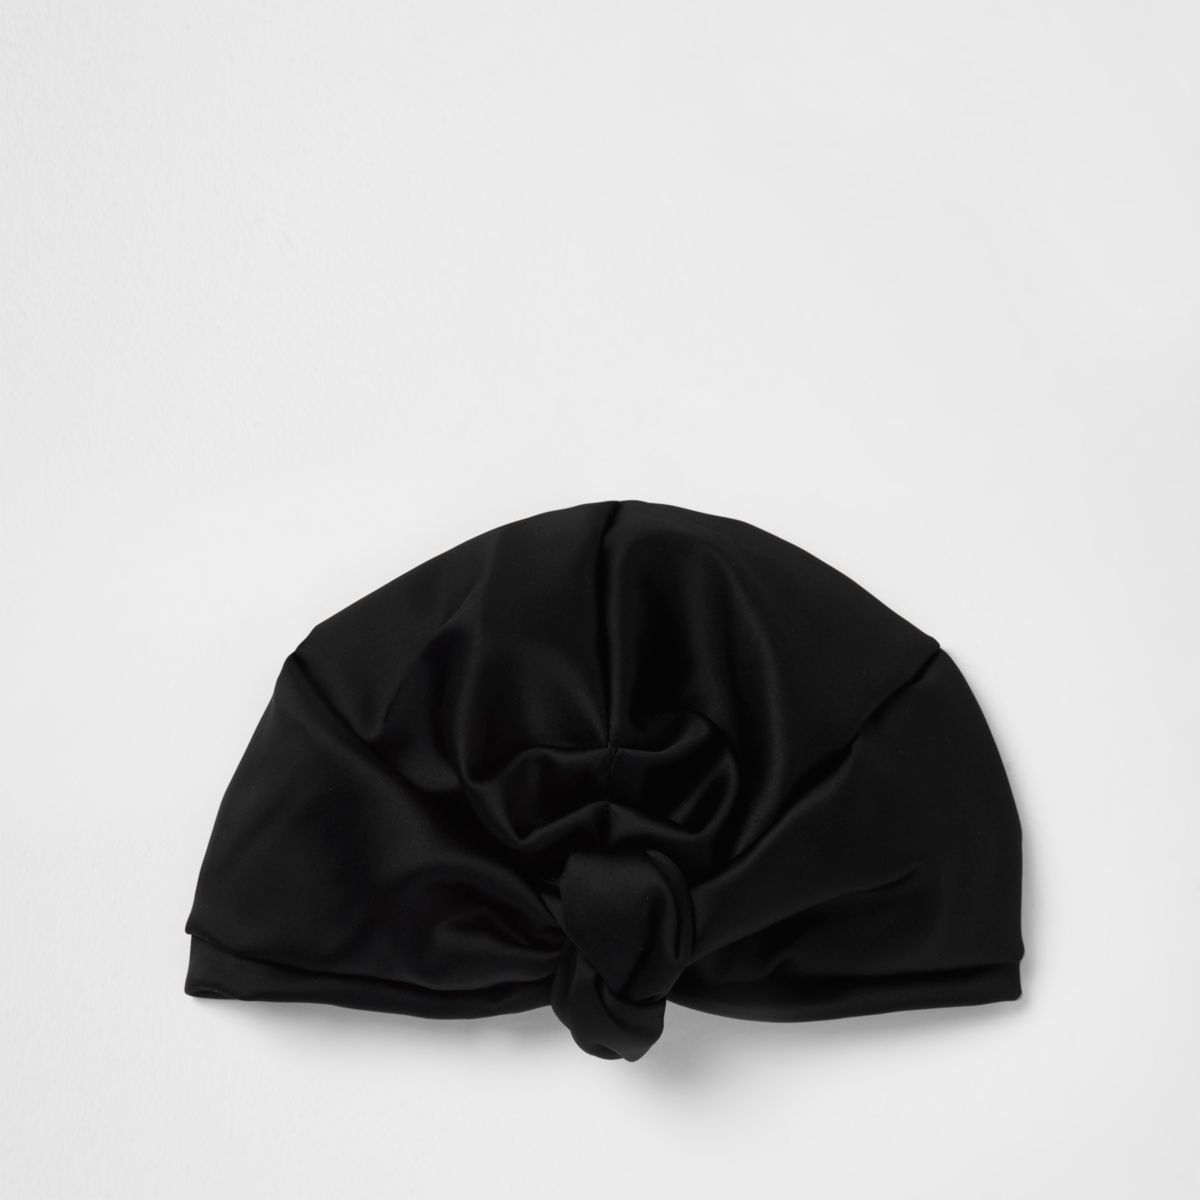 Black satin turban hat